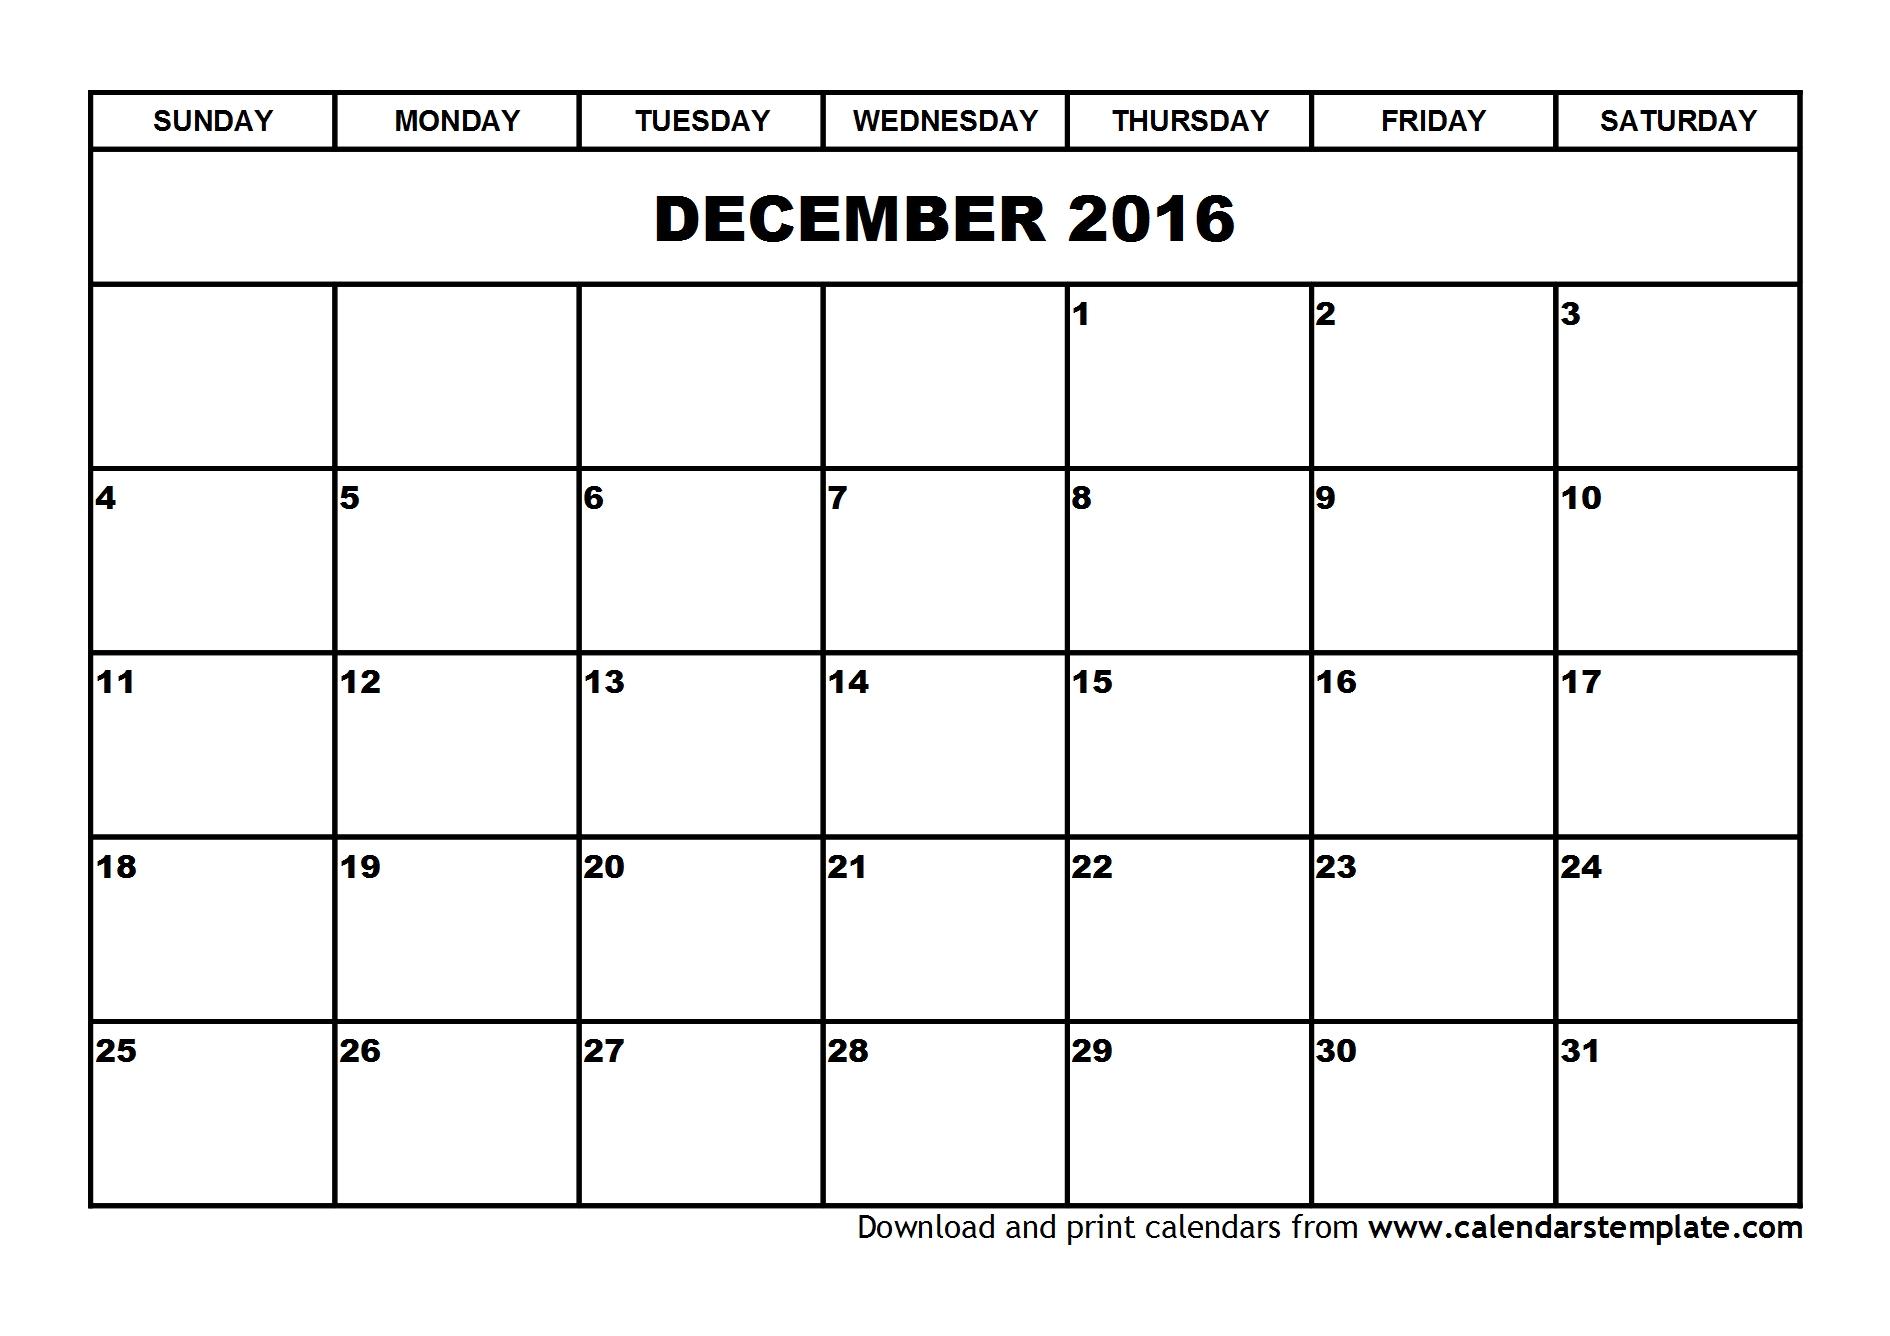 2016 Blank December Calendar Template